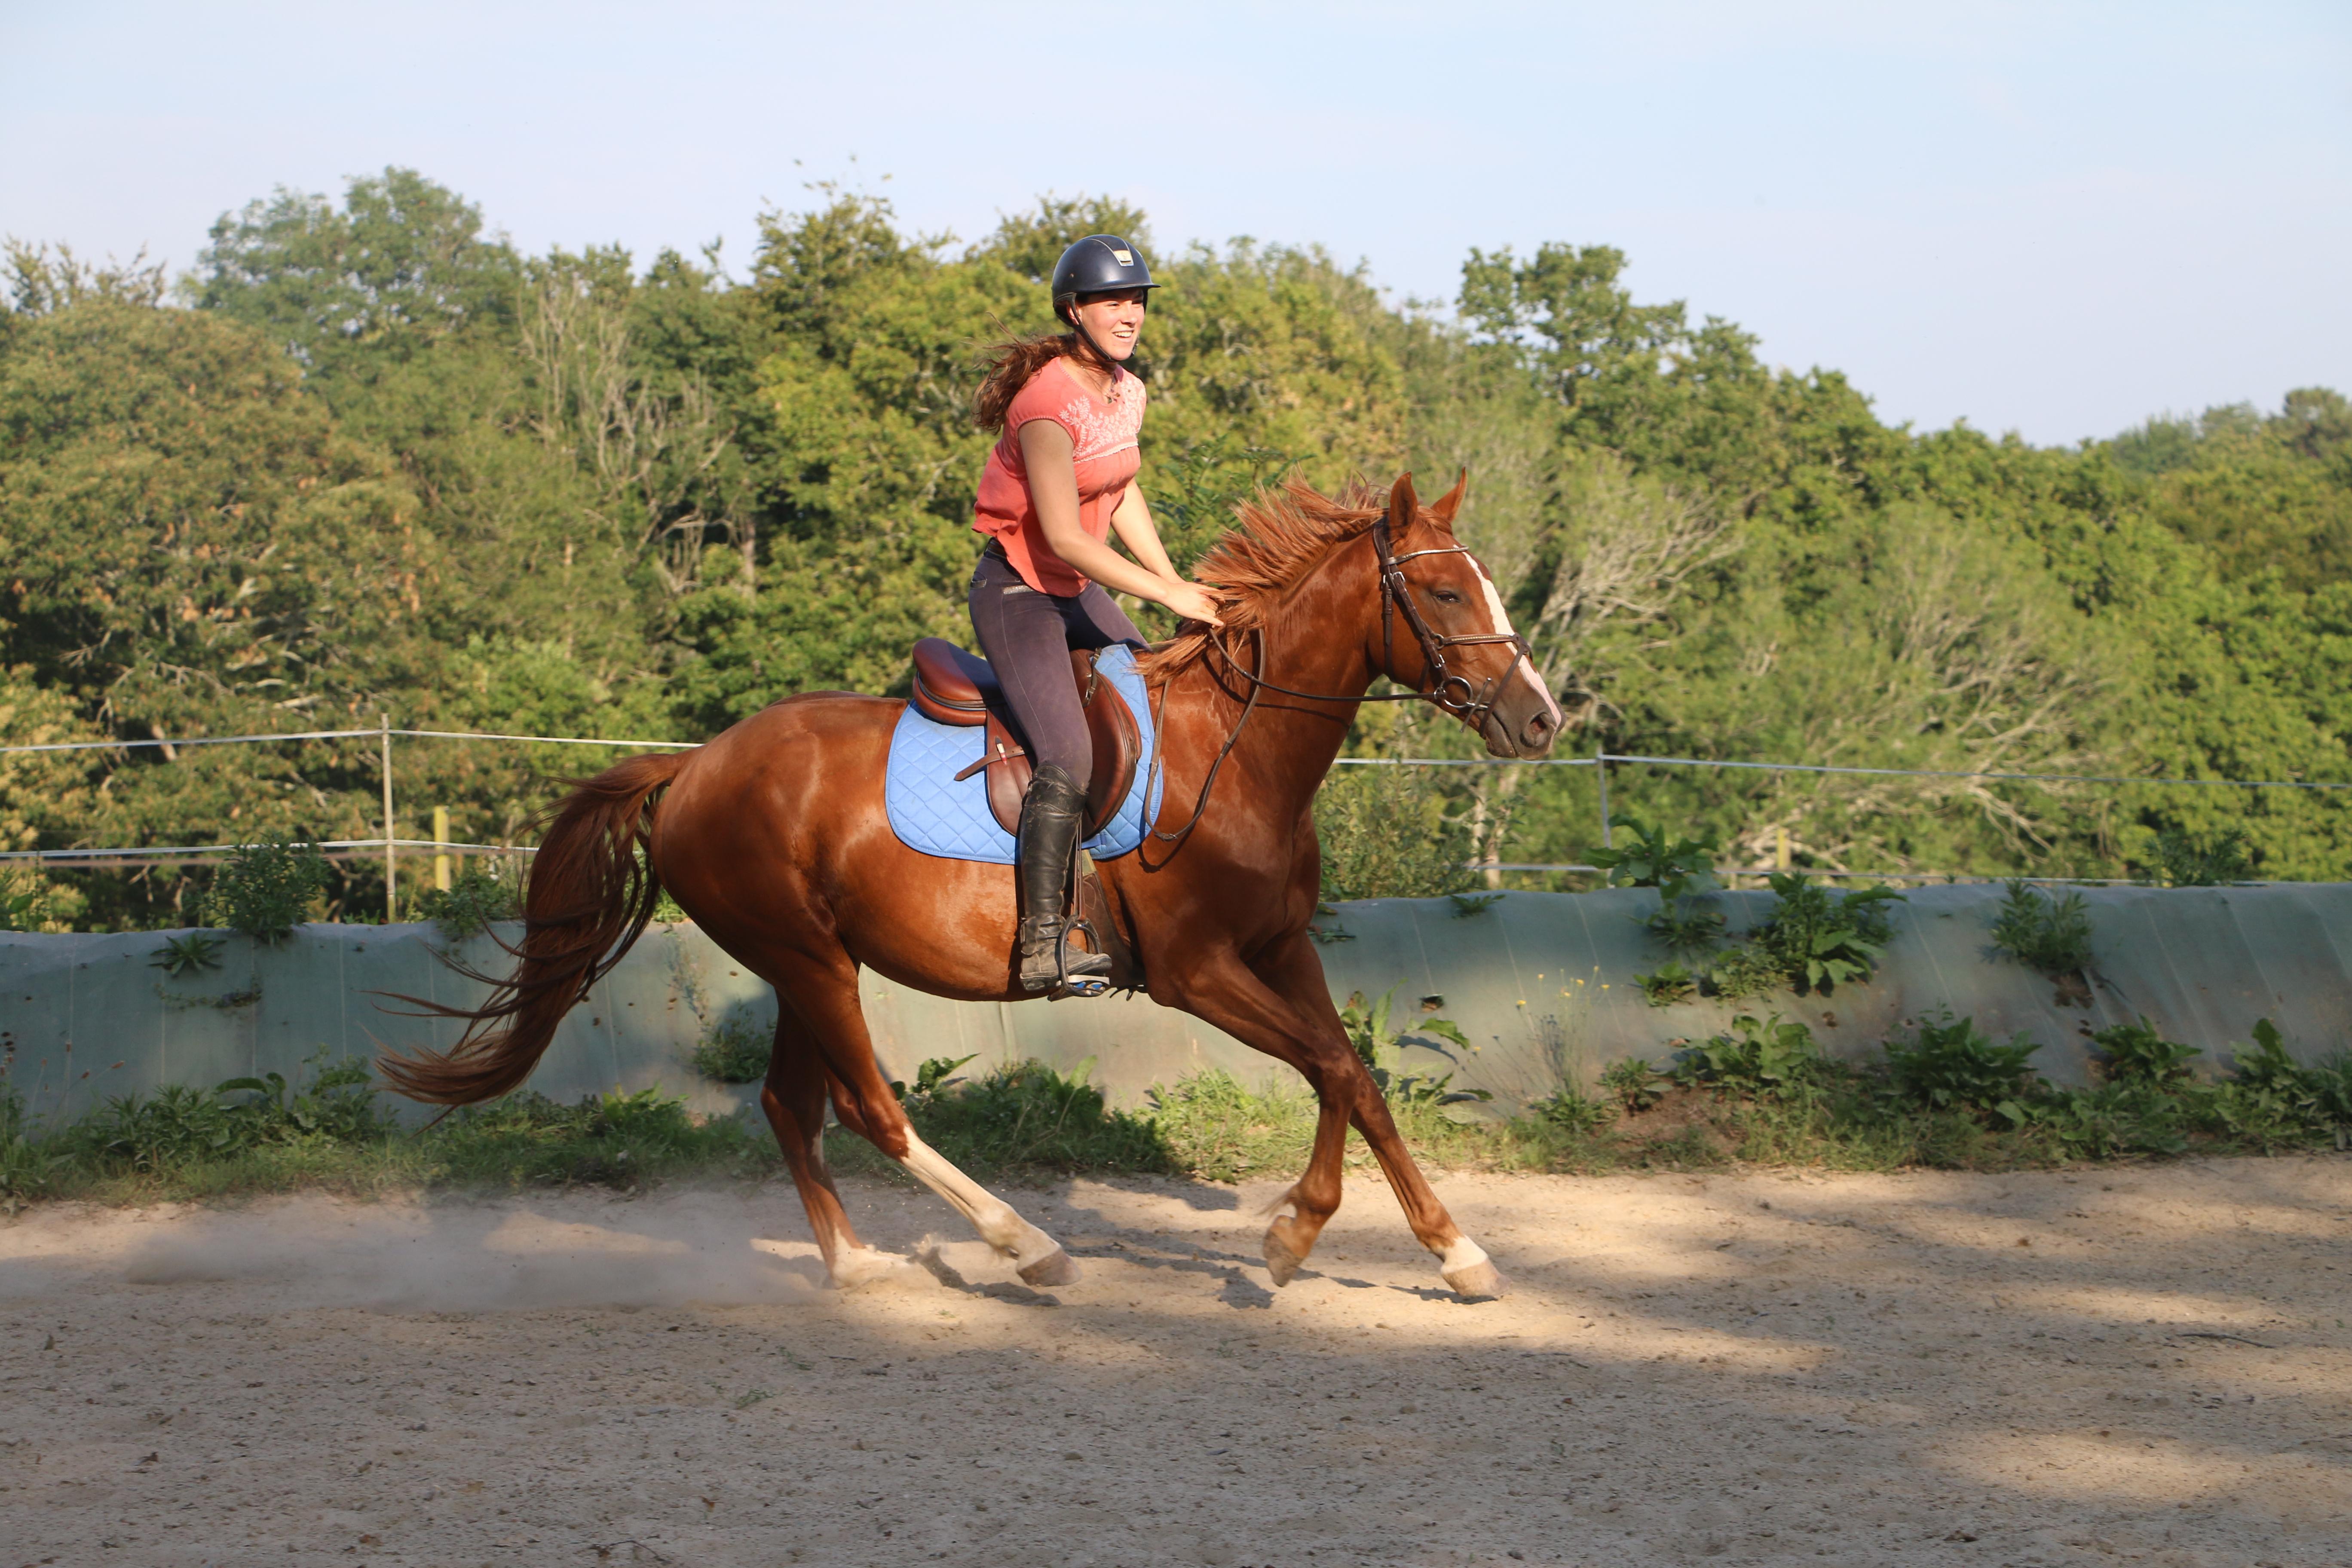 izi sovake cheval de sport à vendre